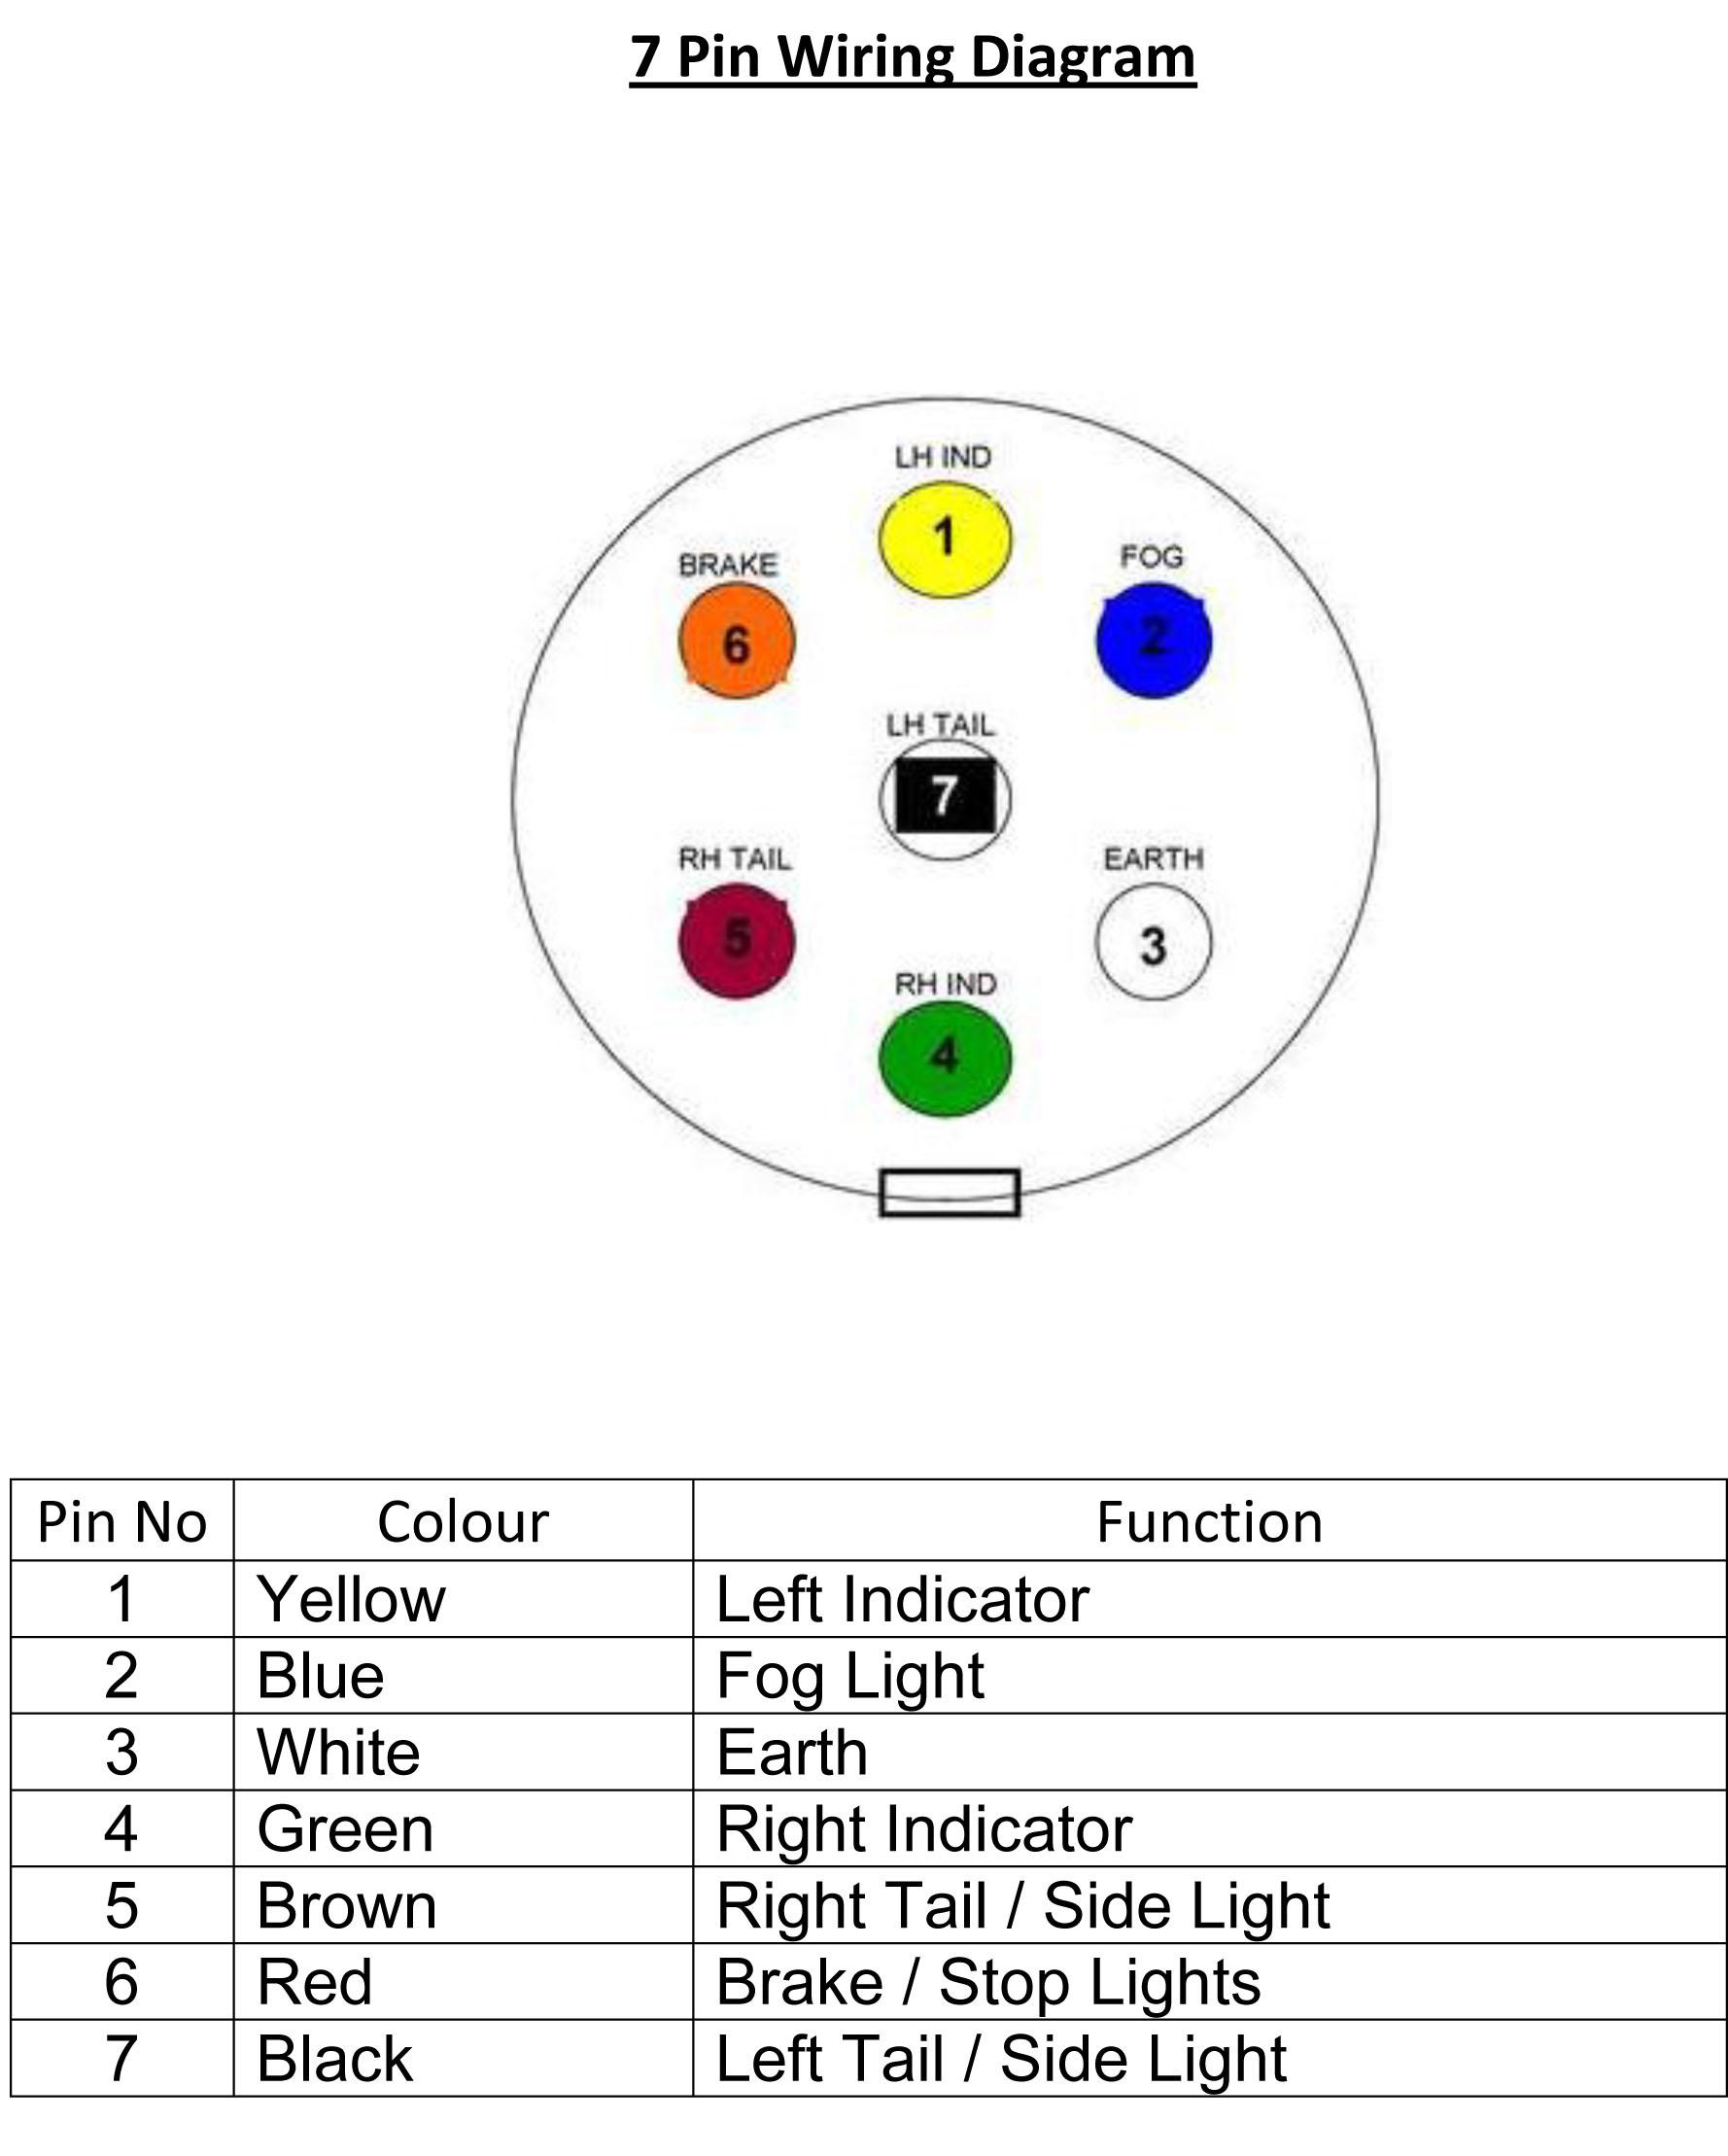 7 Pin Wiring Diagram 7 Pin Wire Diagram Today Diagram Database